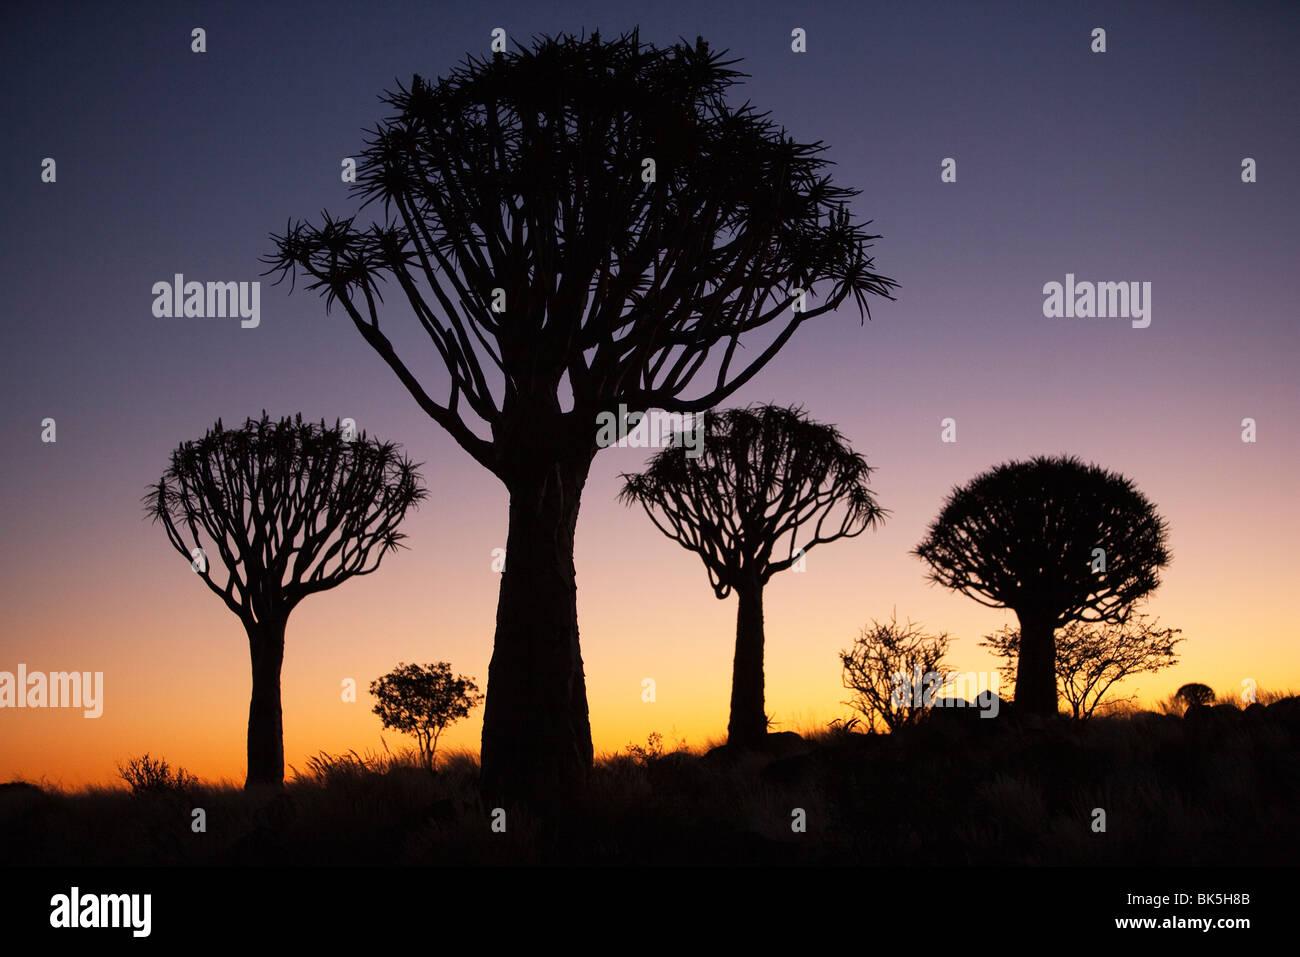 Arbres carquois (Aloe dichotoma), forêt Quiver Tree silhouette, Keetmanshoop, Namibie, Afrique du Sud Photo Stock